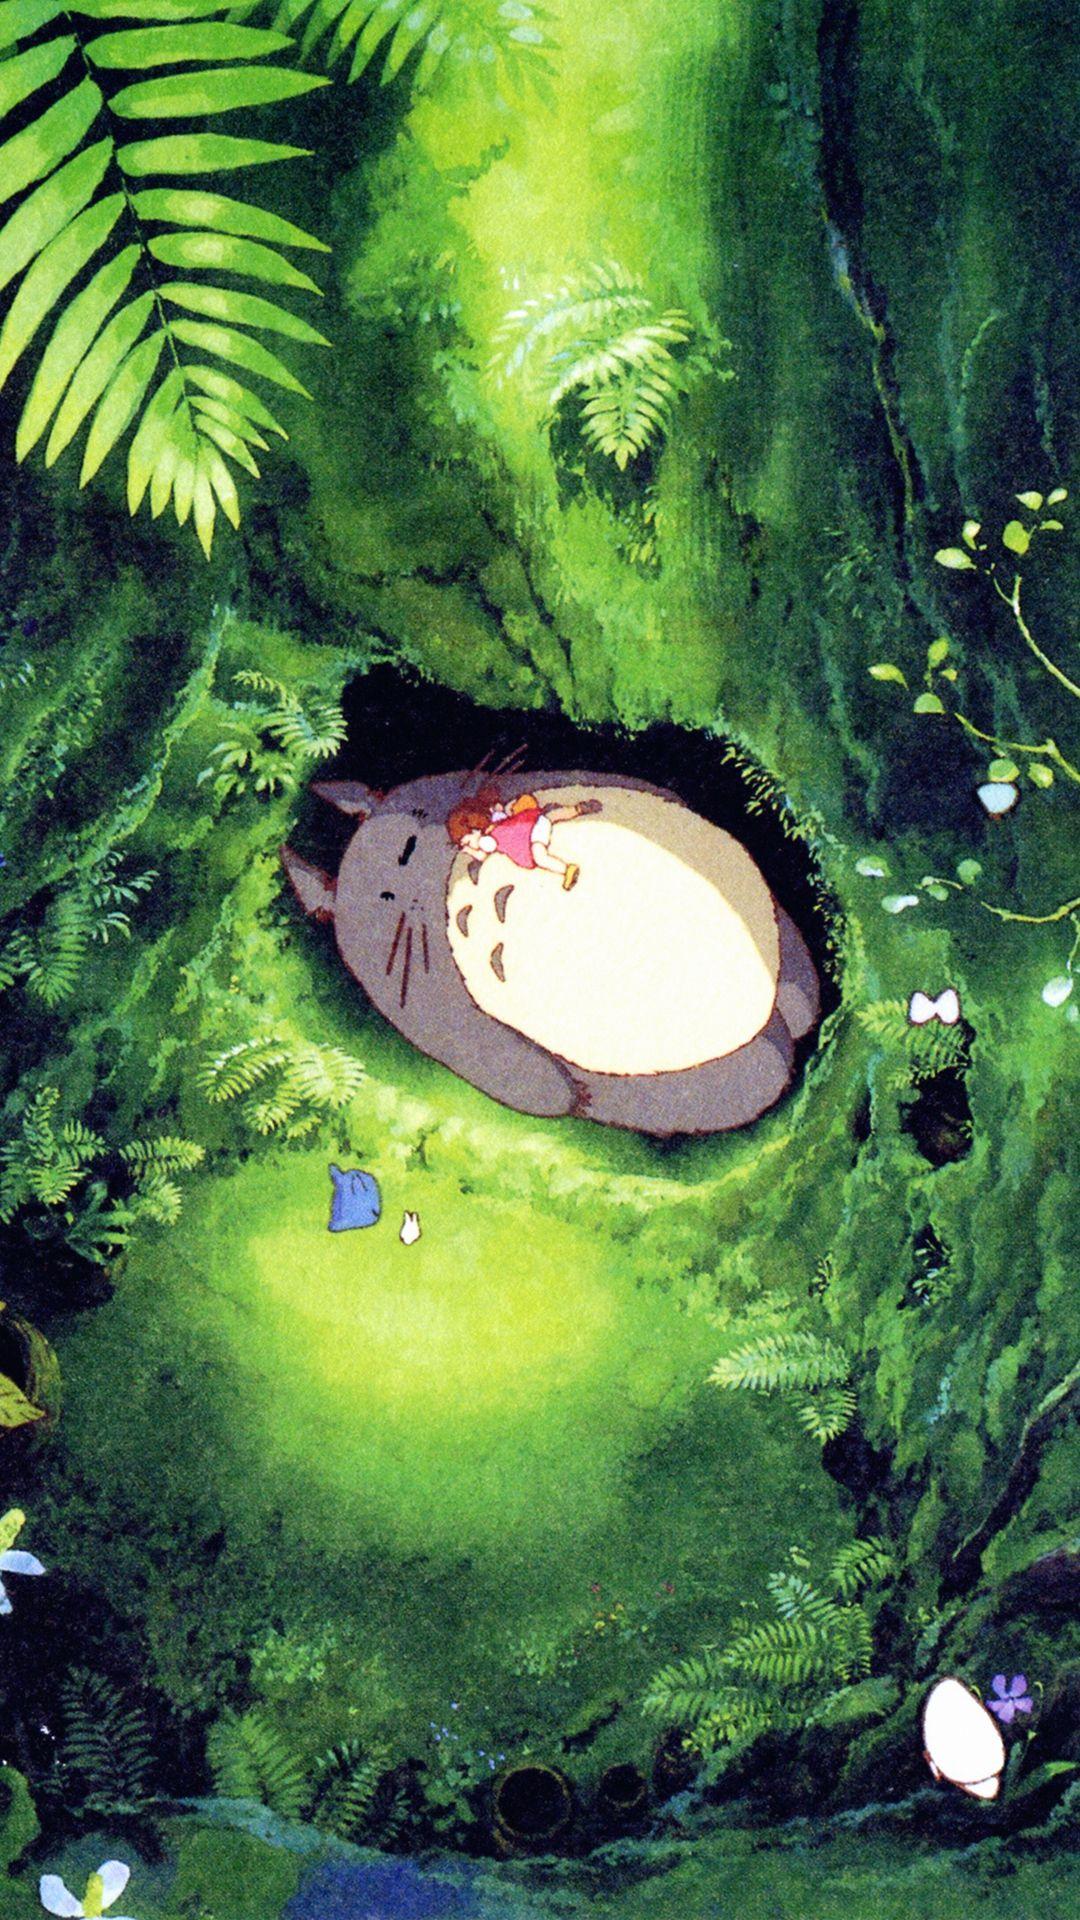 Wallpaper iphone totoro - Japan Totoro Art Green Anime Illustration Iphone 6 Wallpaper